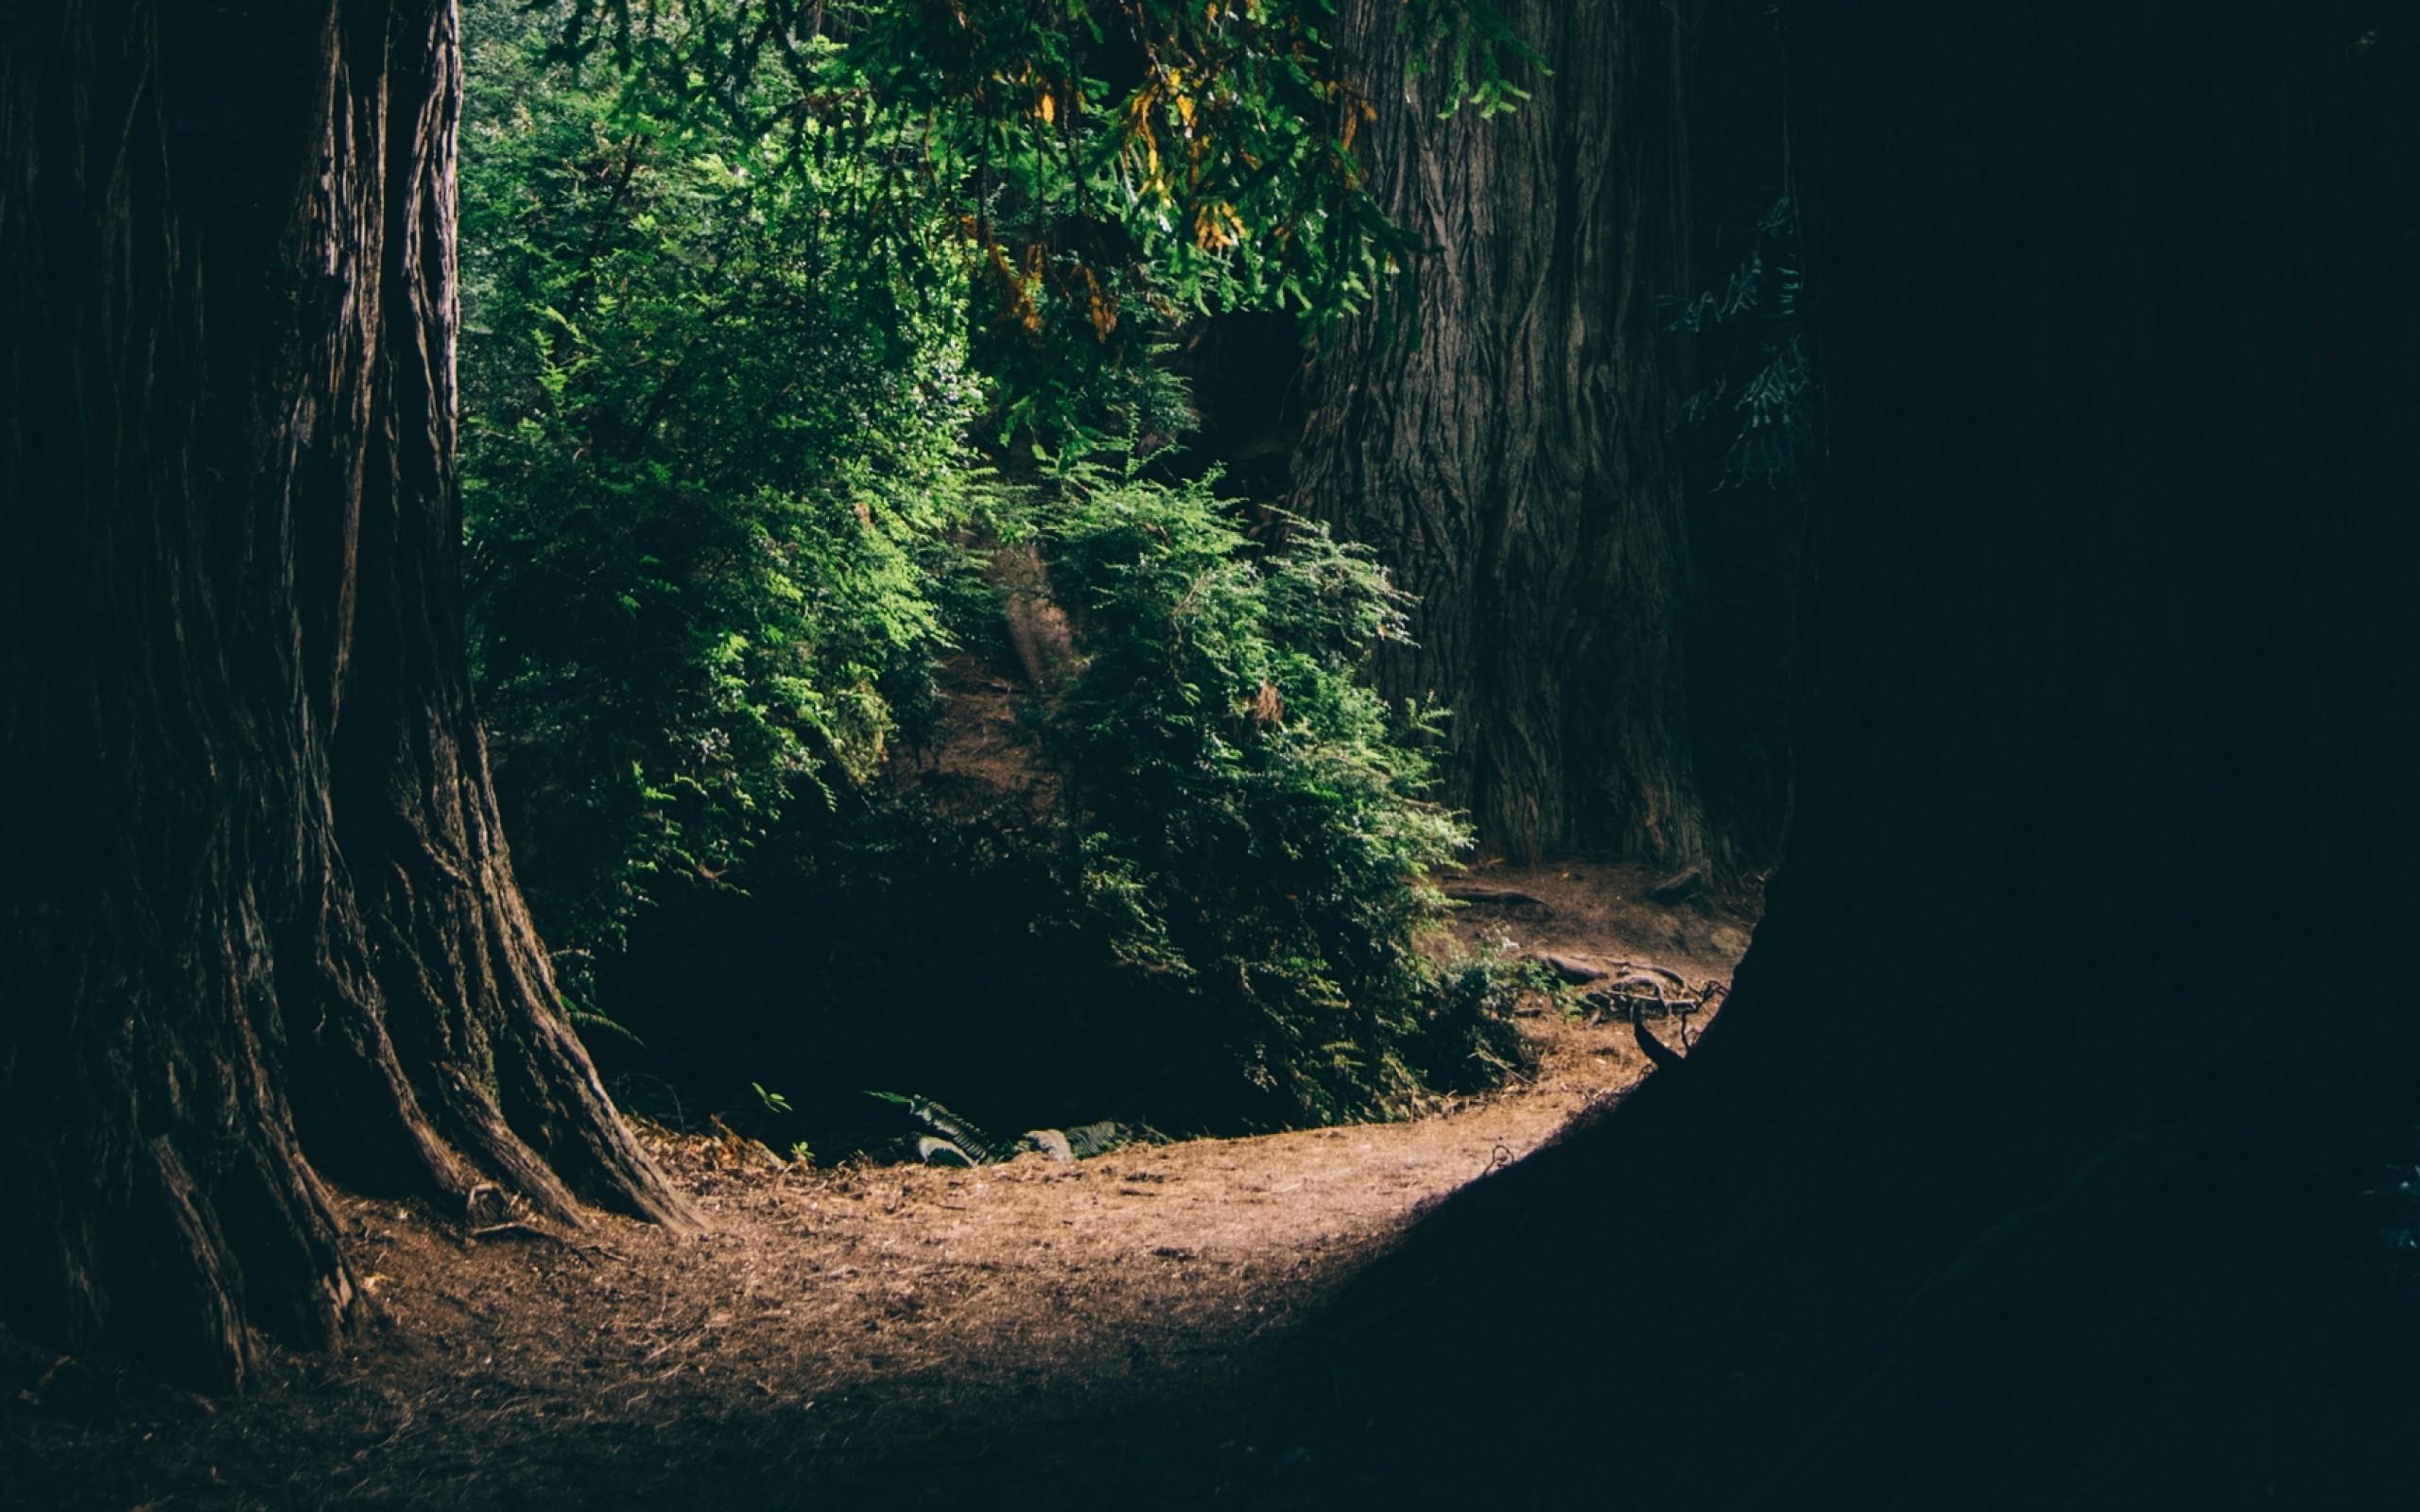 Dark Forest Passage Hd Wallpaper 13 Retina Macbook Pro Hd Wallpaper Wallpapers Net